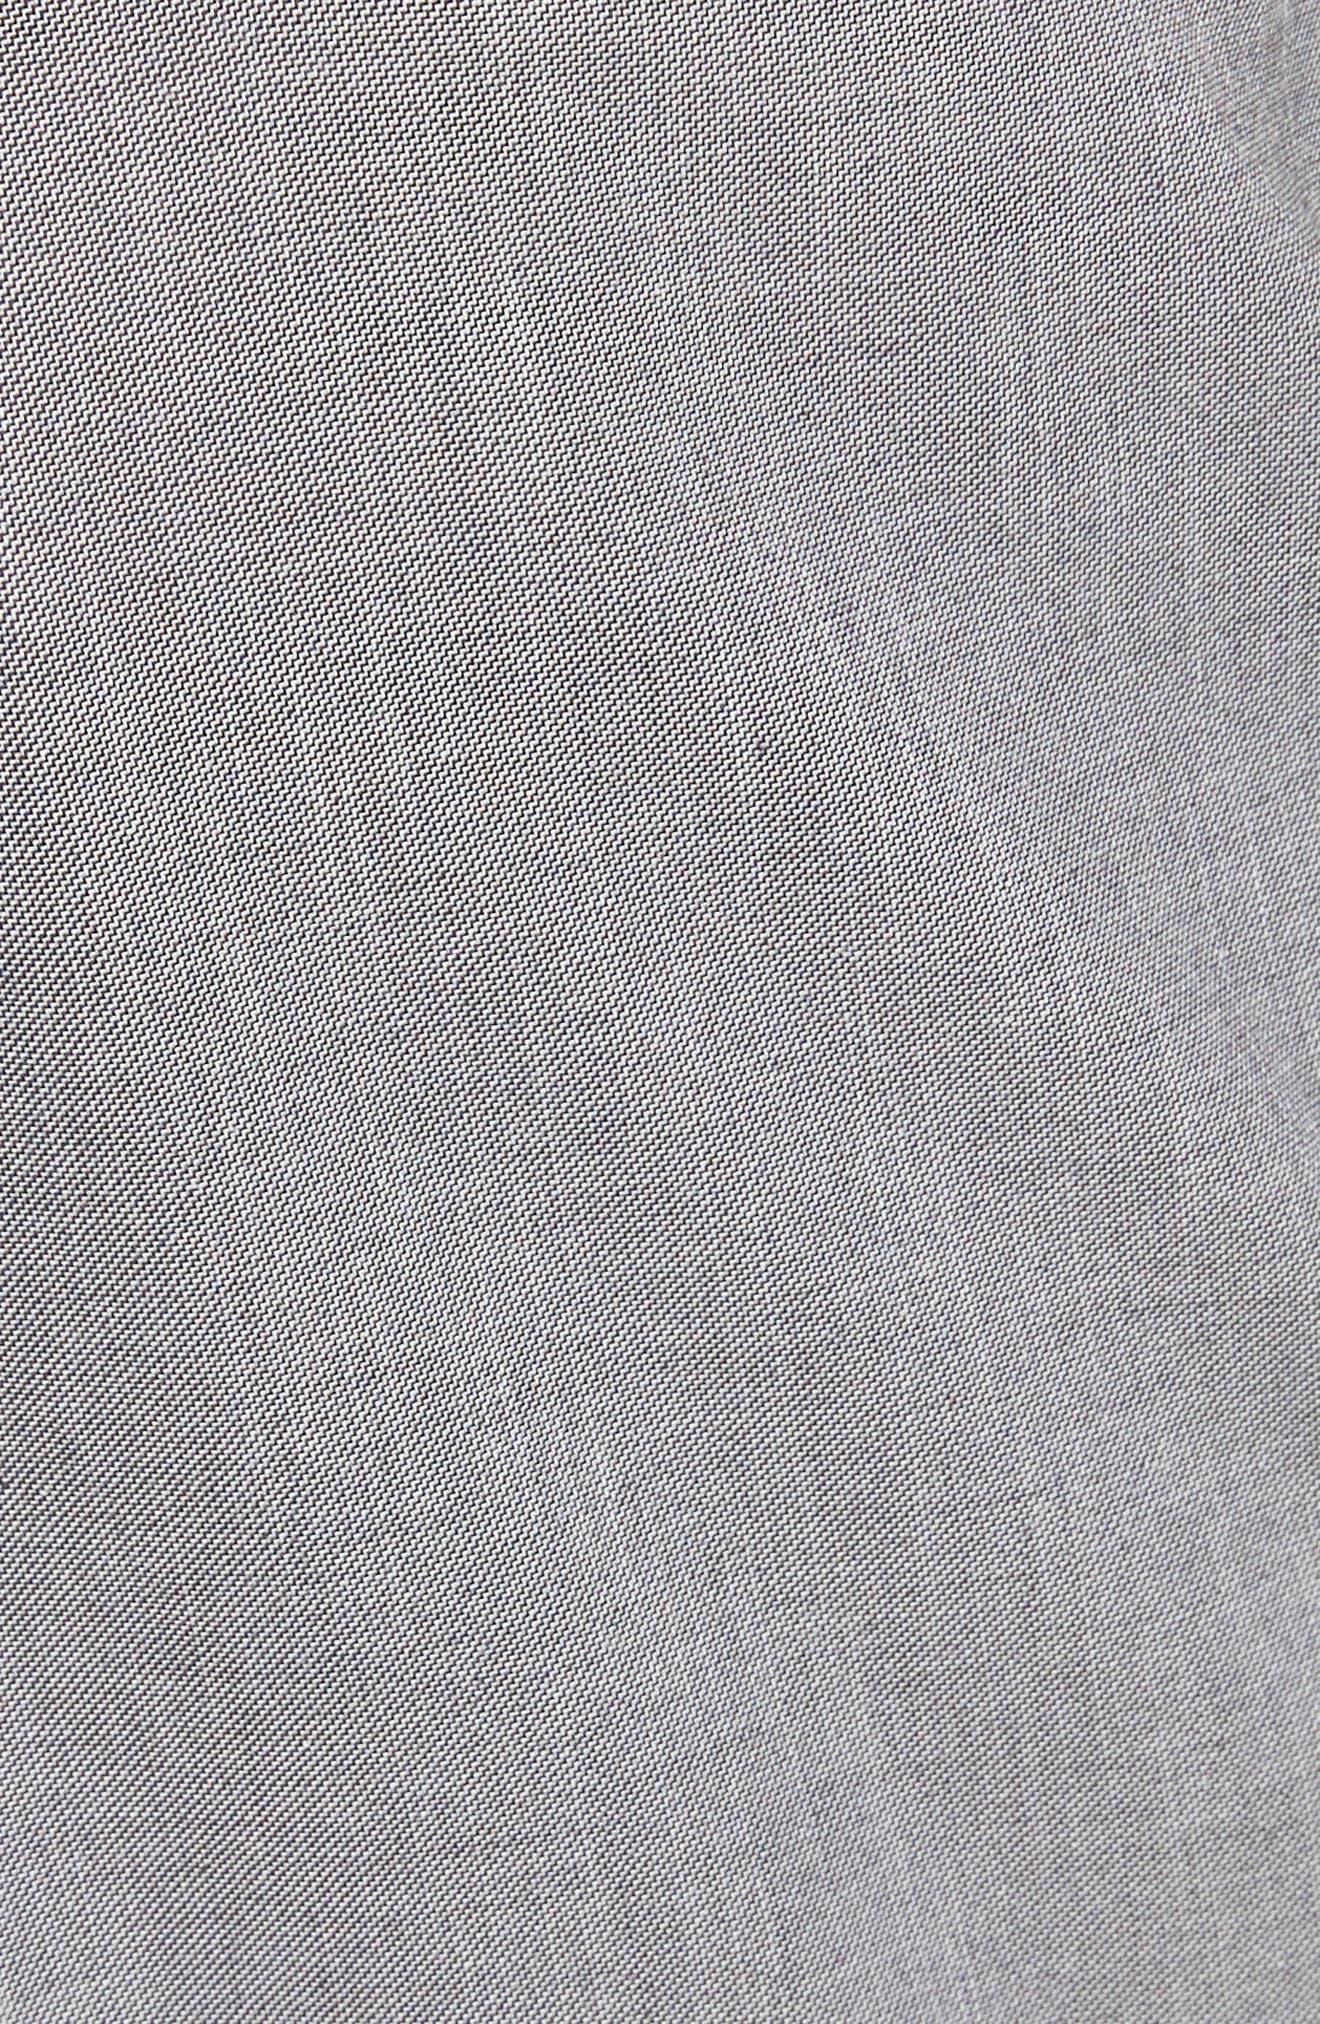 French Pocket Stretch Straight Leg Pants,                             Alternate thumbnail 5, color,                             Grey